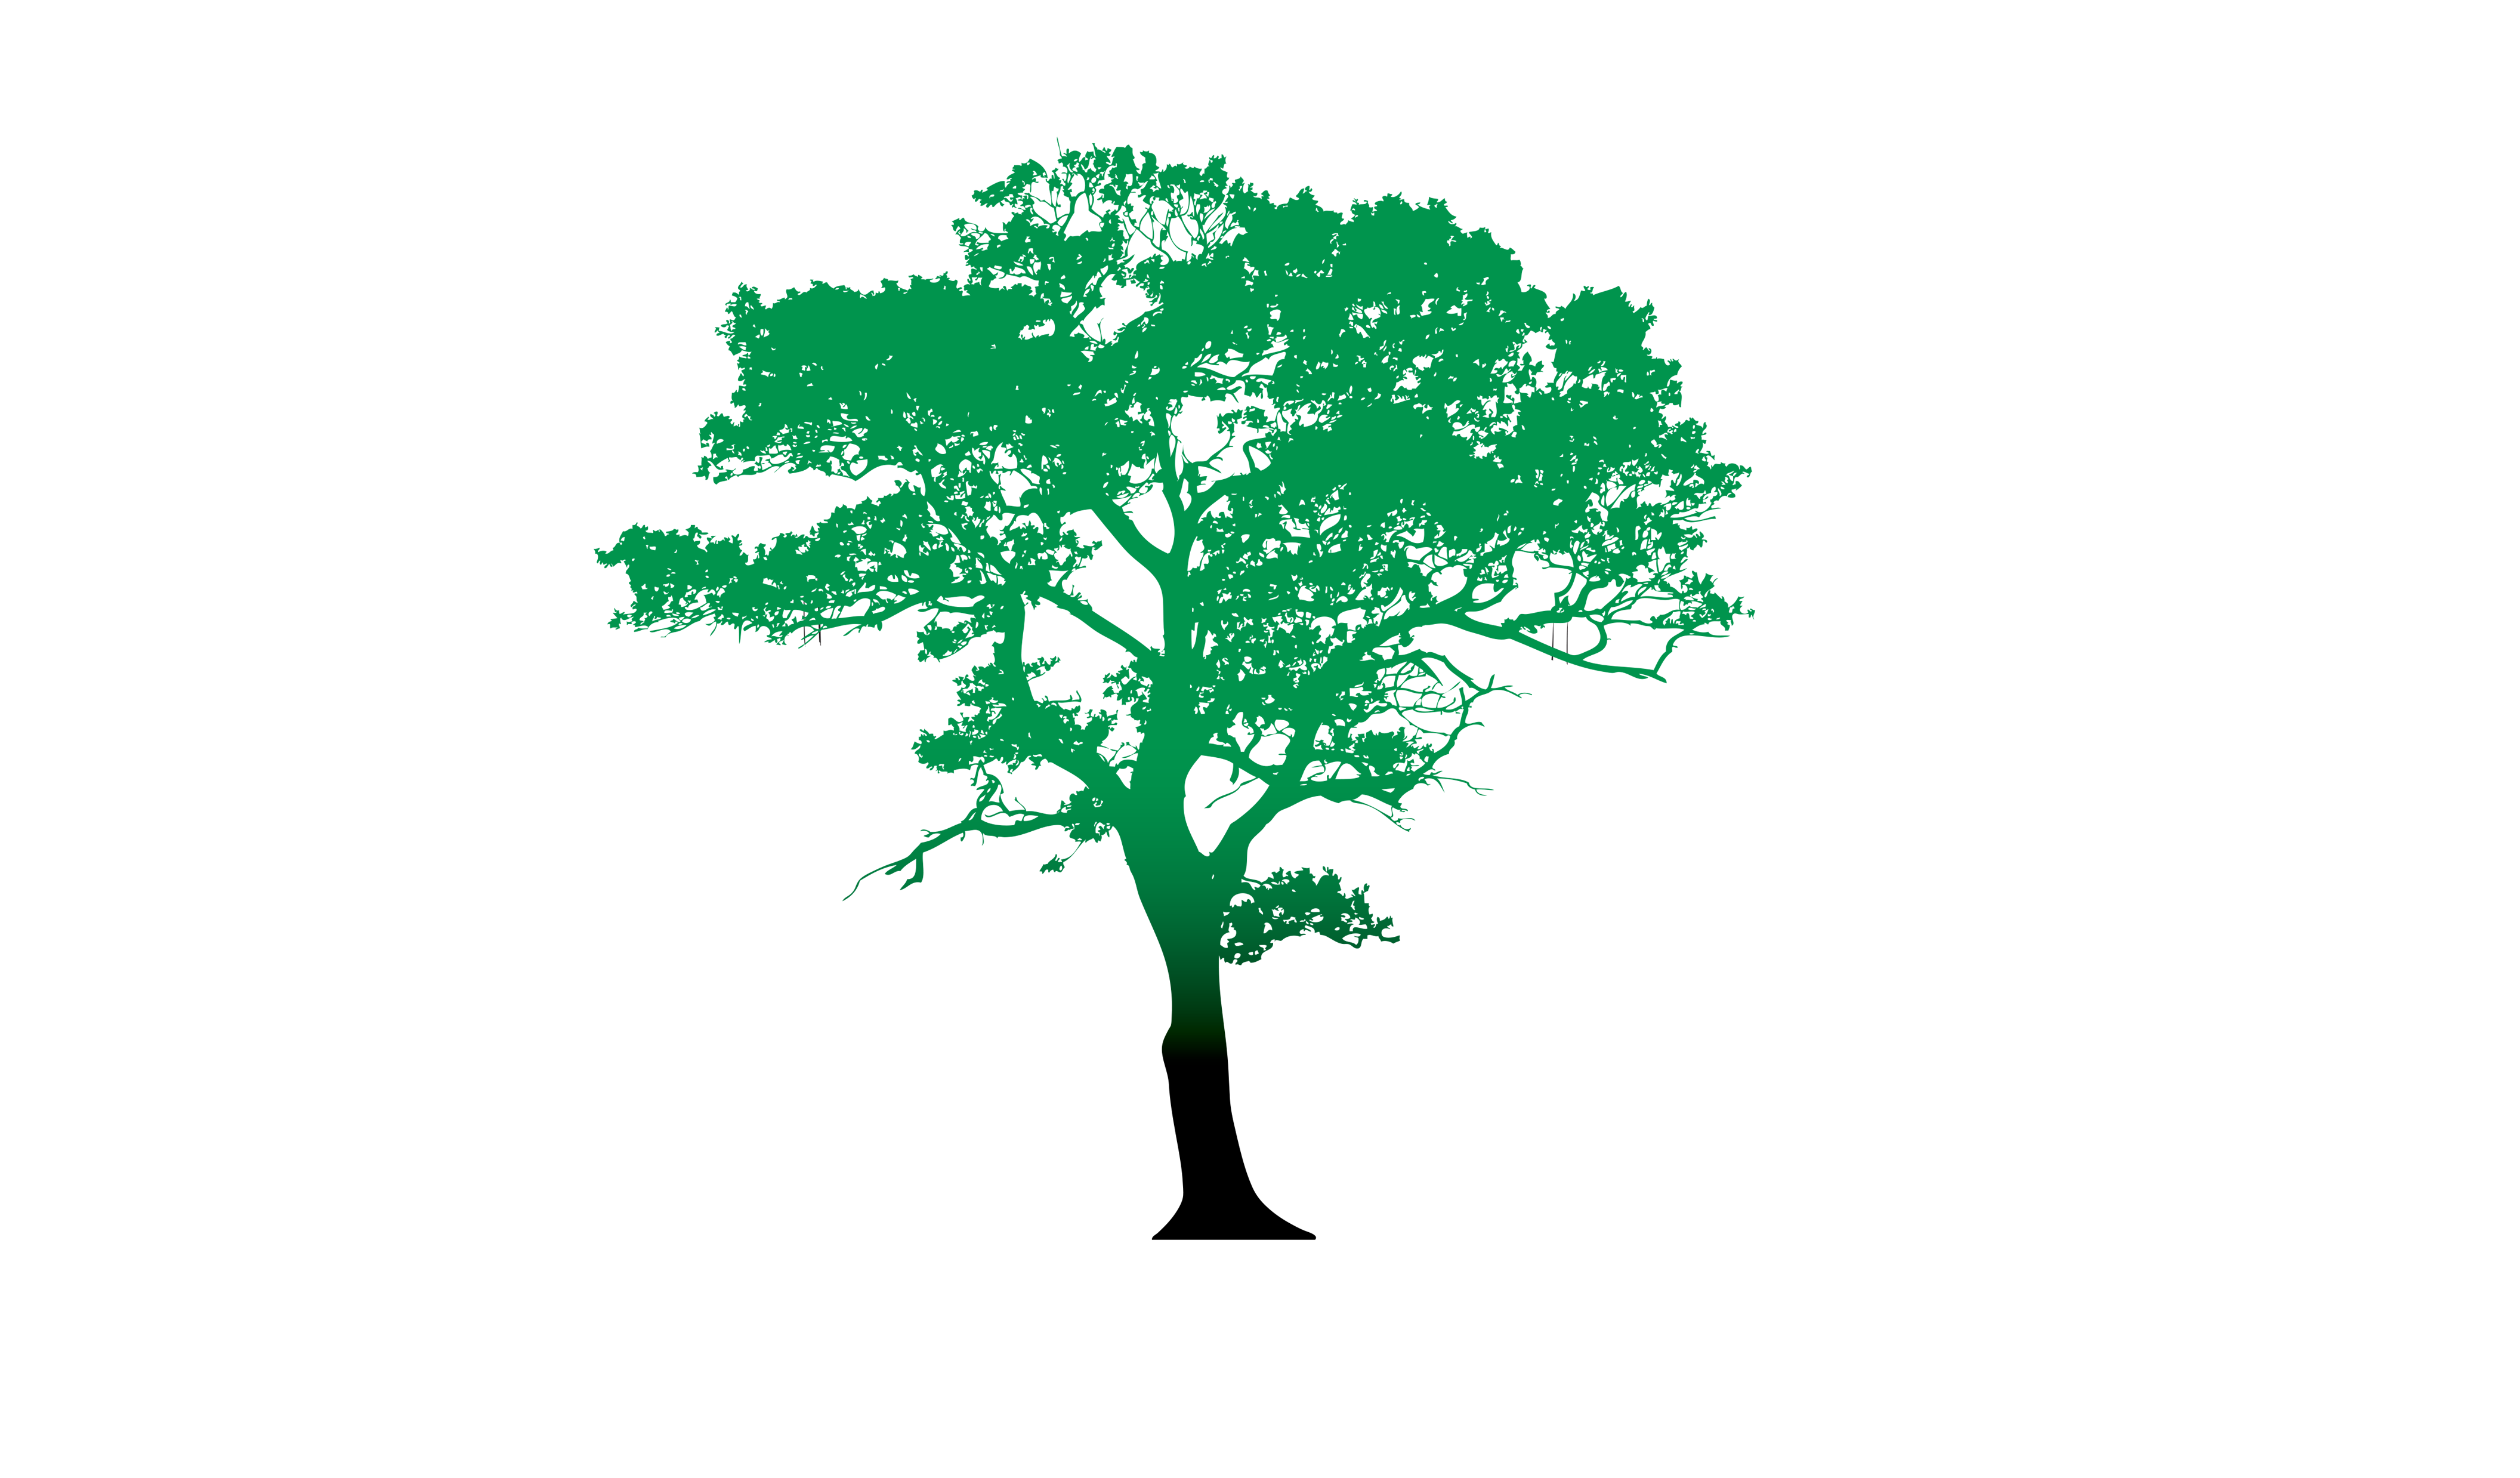 StromExpert